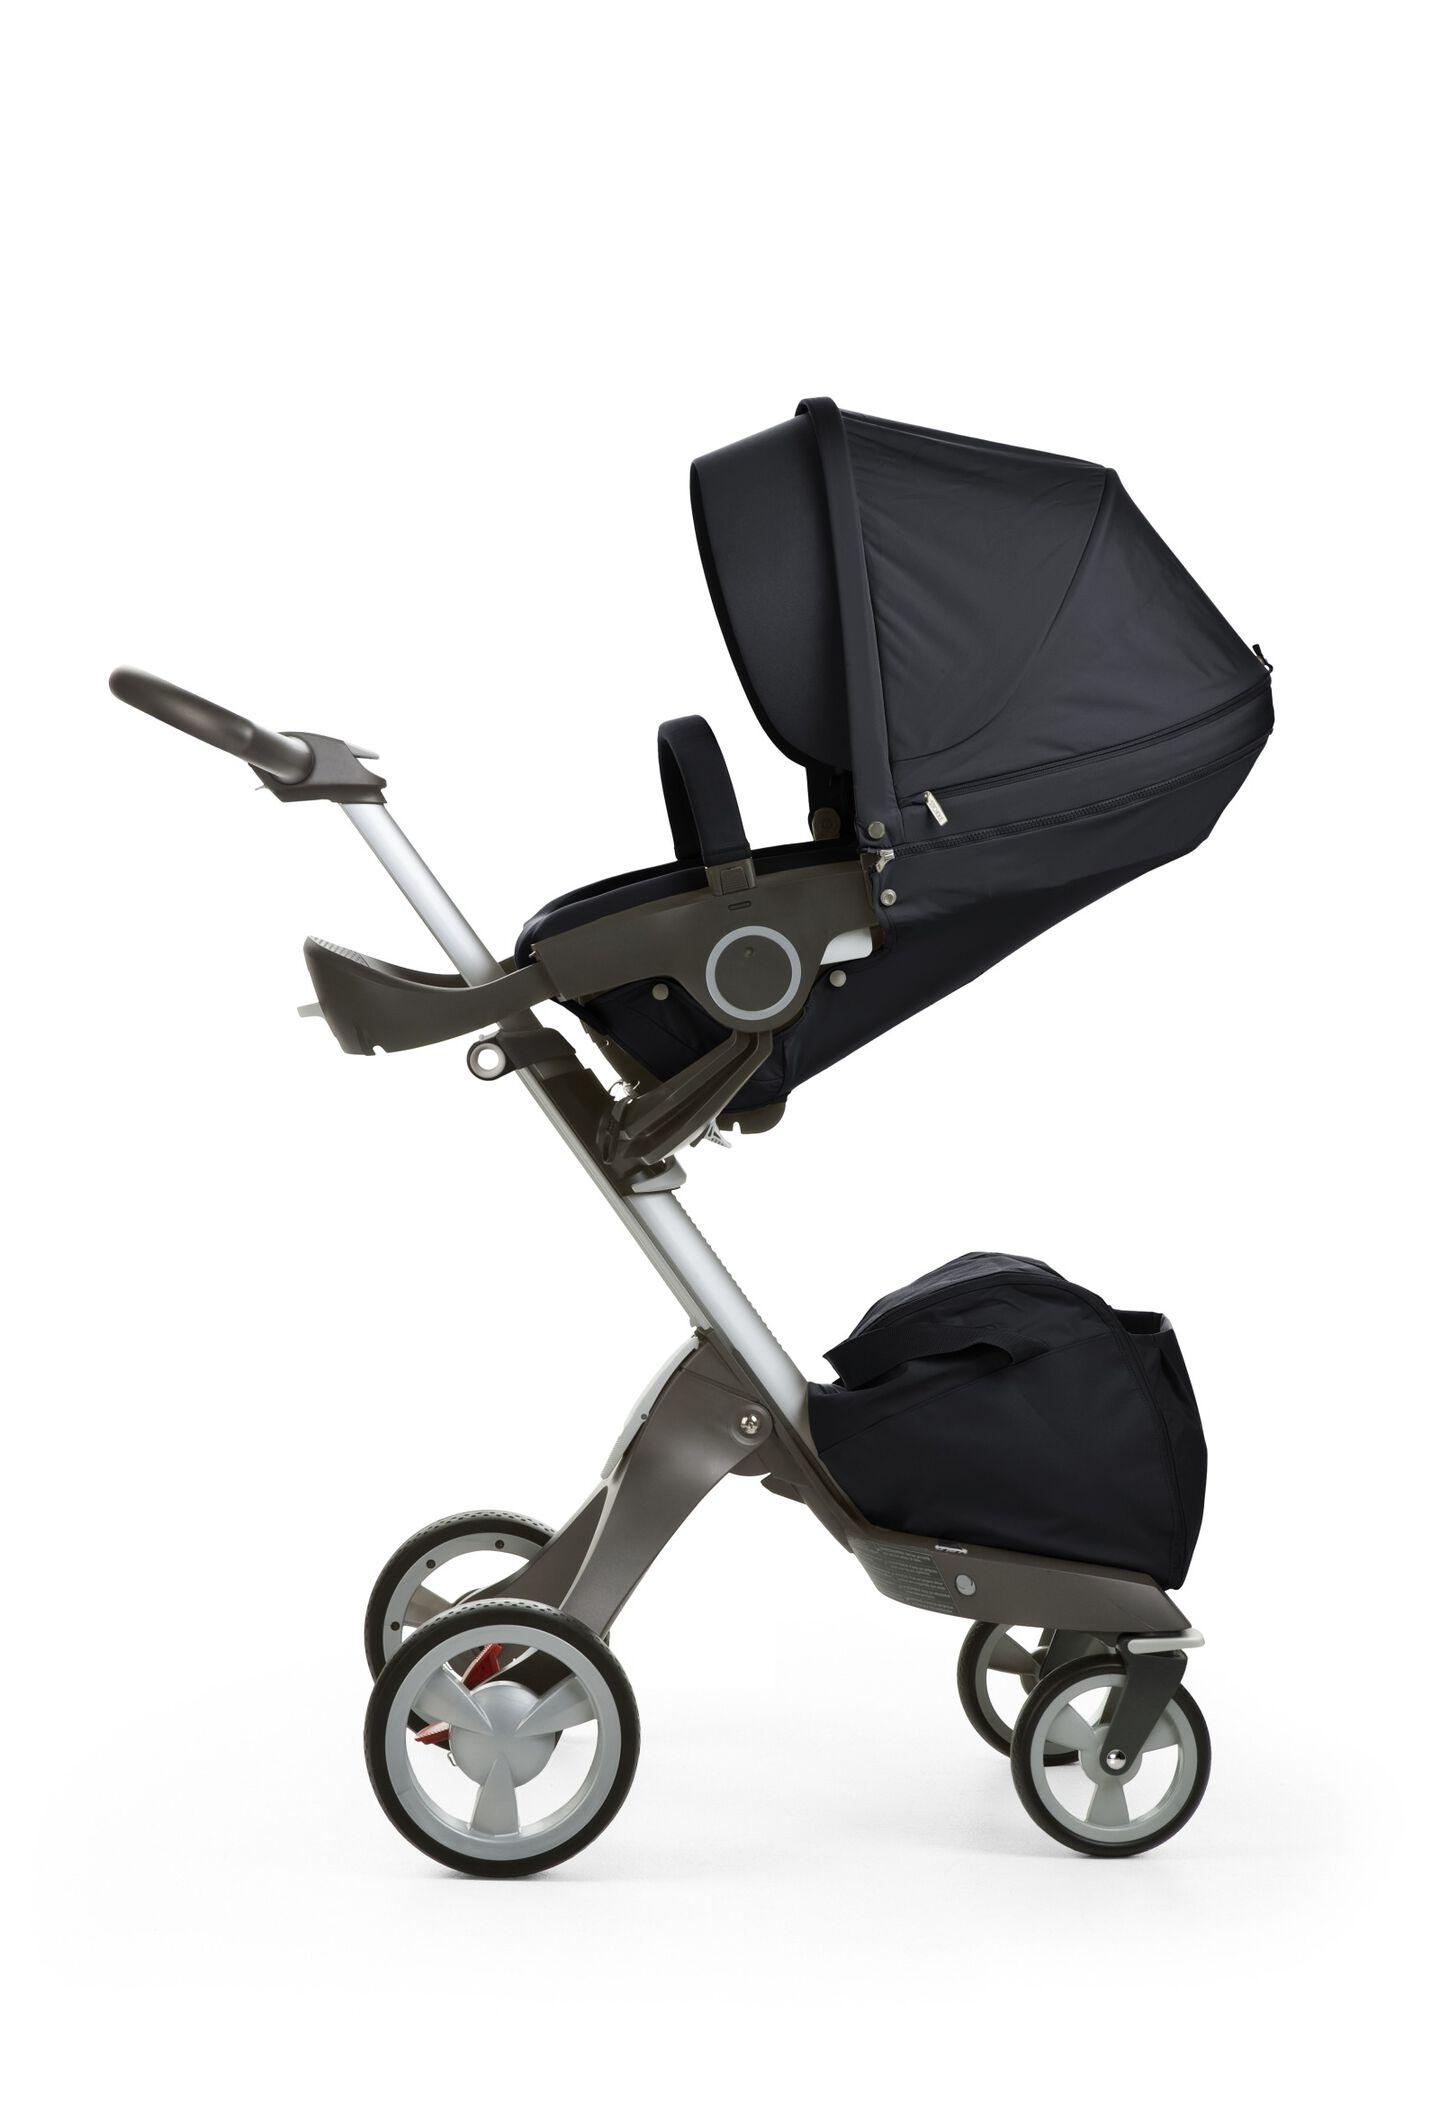 Stokke® Xplory® with Stokke® Stroller Seat, Dark Navy.